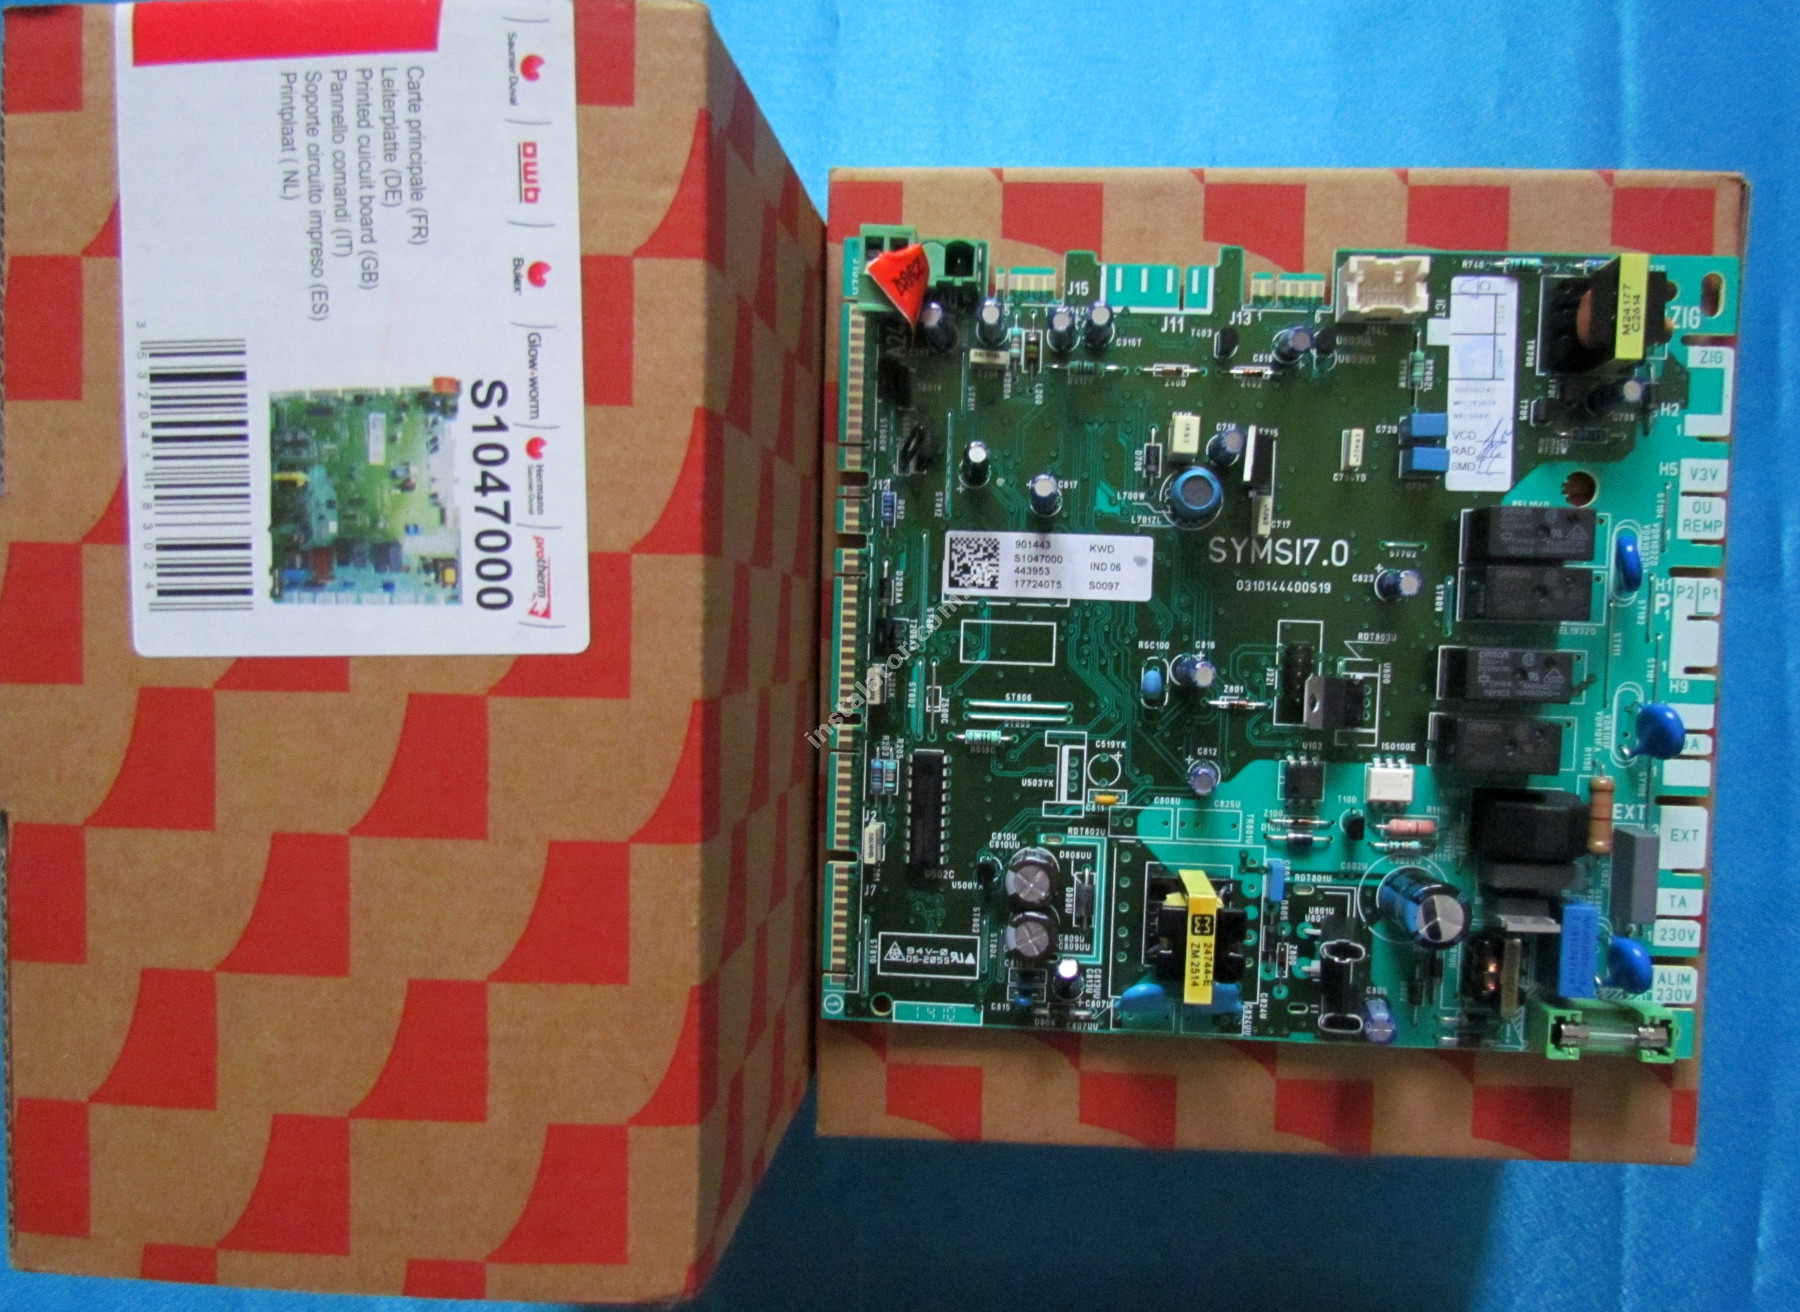 S1047000 Плата керування (основна) SAUNIER DUVAL ThemaClassic, Isofast, Combitek full-image-0